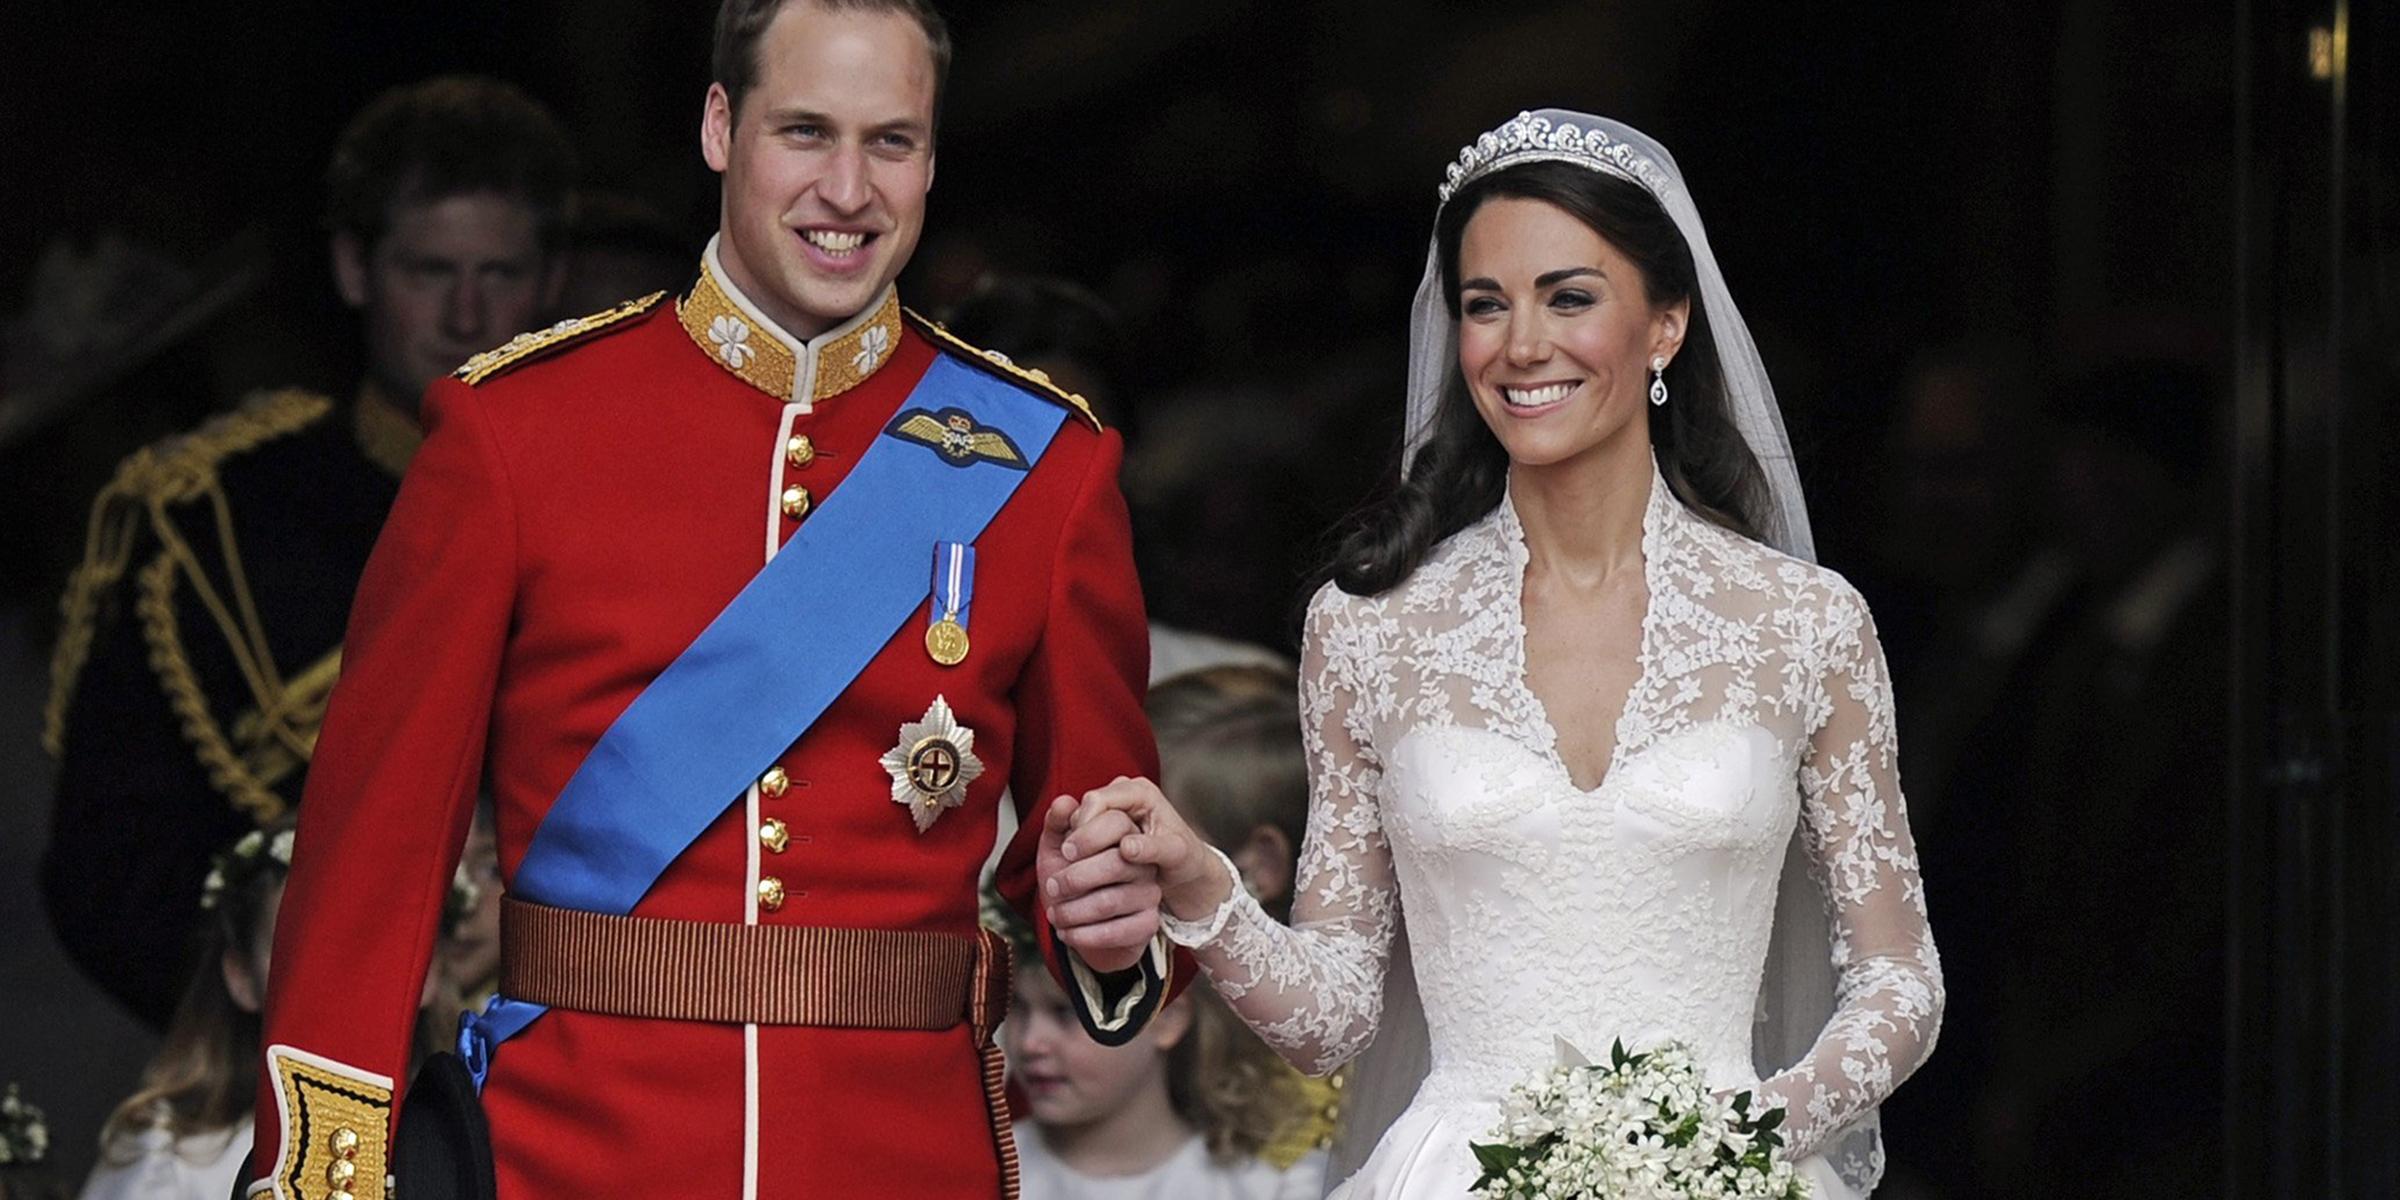 Royal wedding trivia ahead of Meghan Markle, Prince Harry wedding